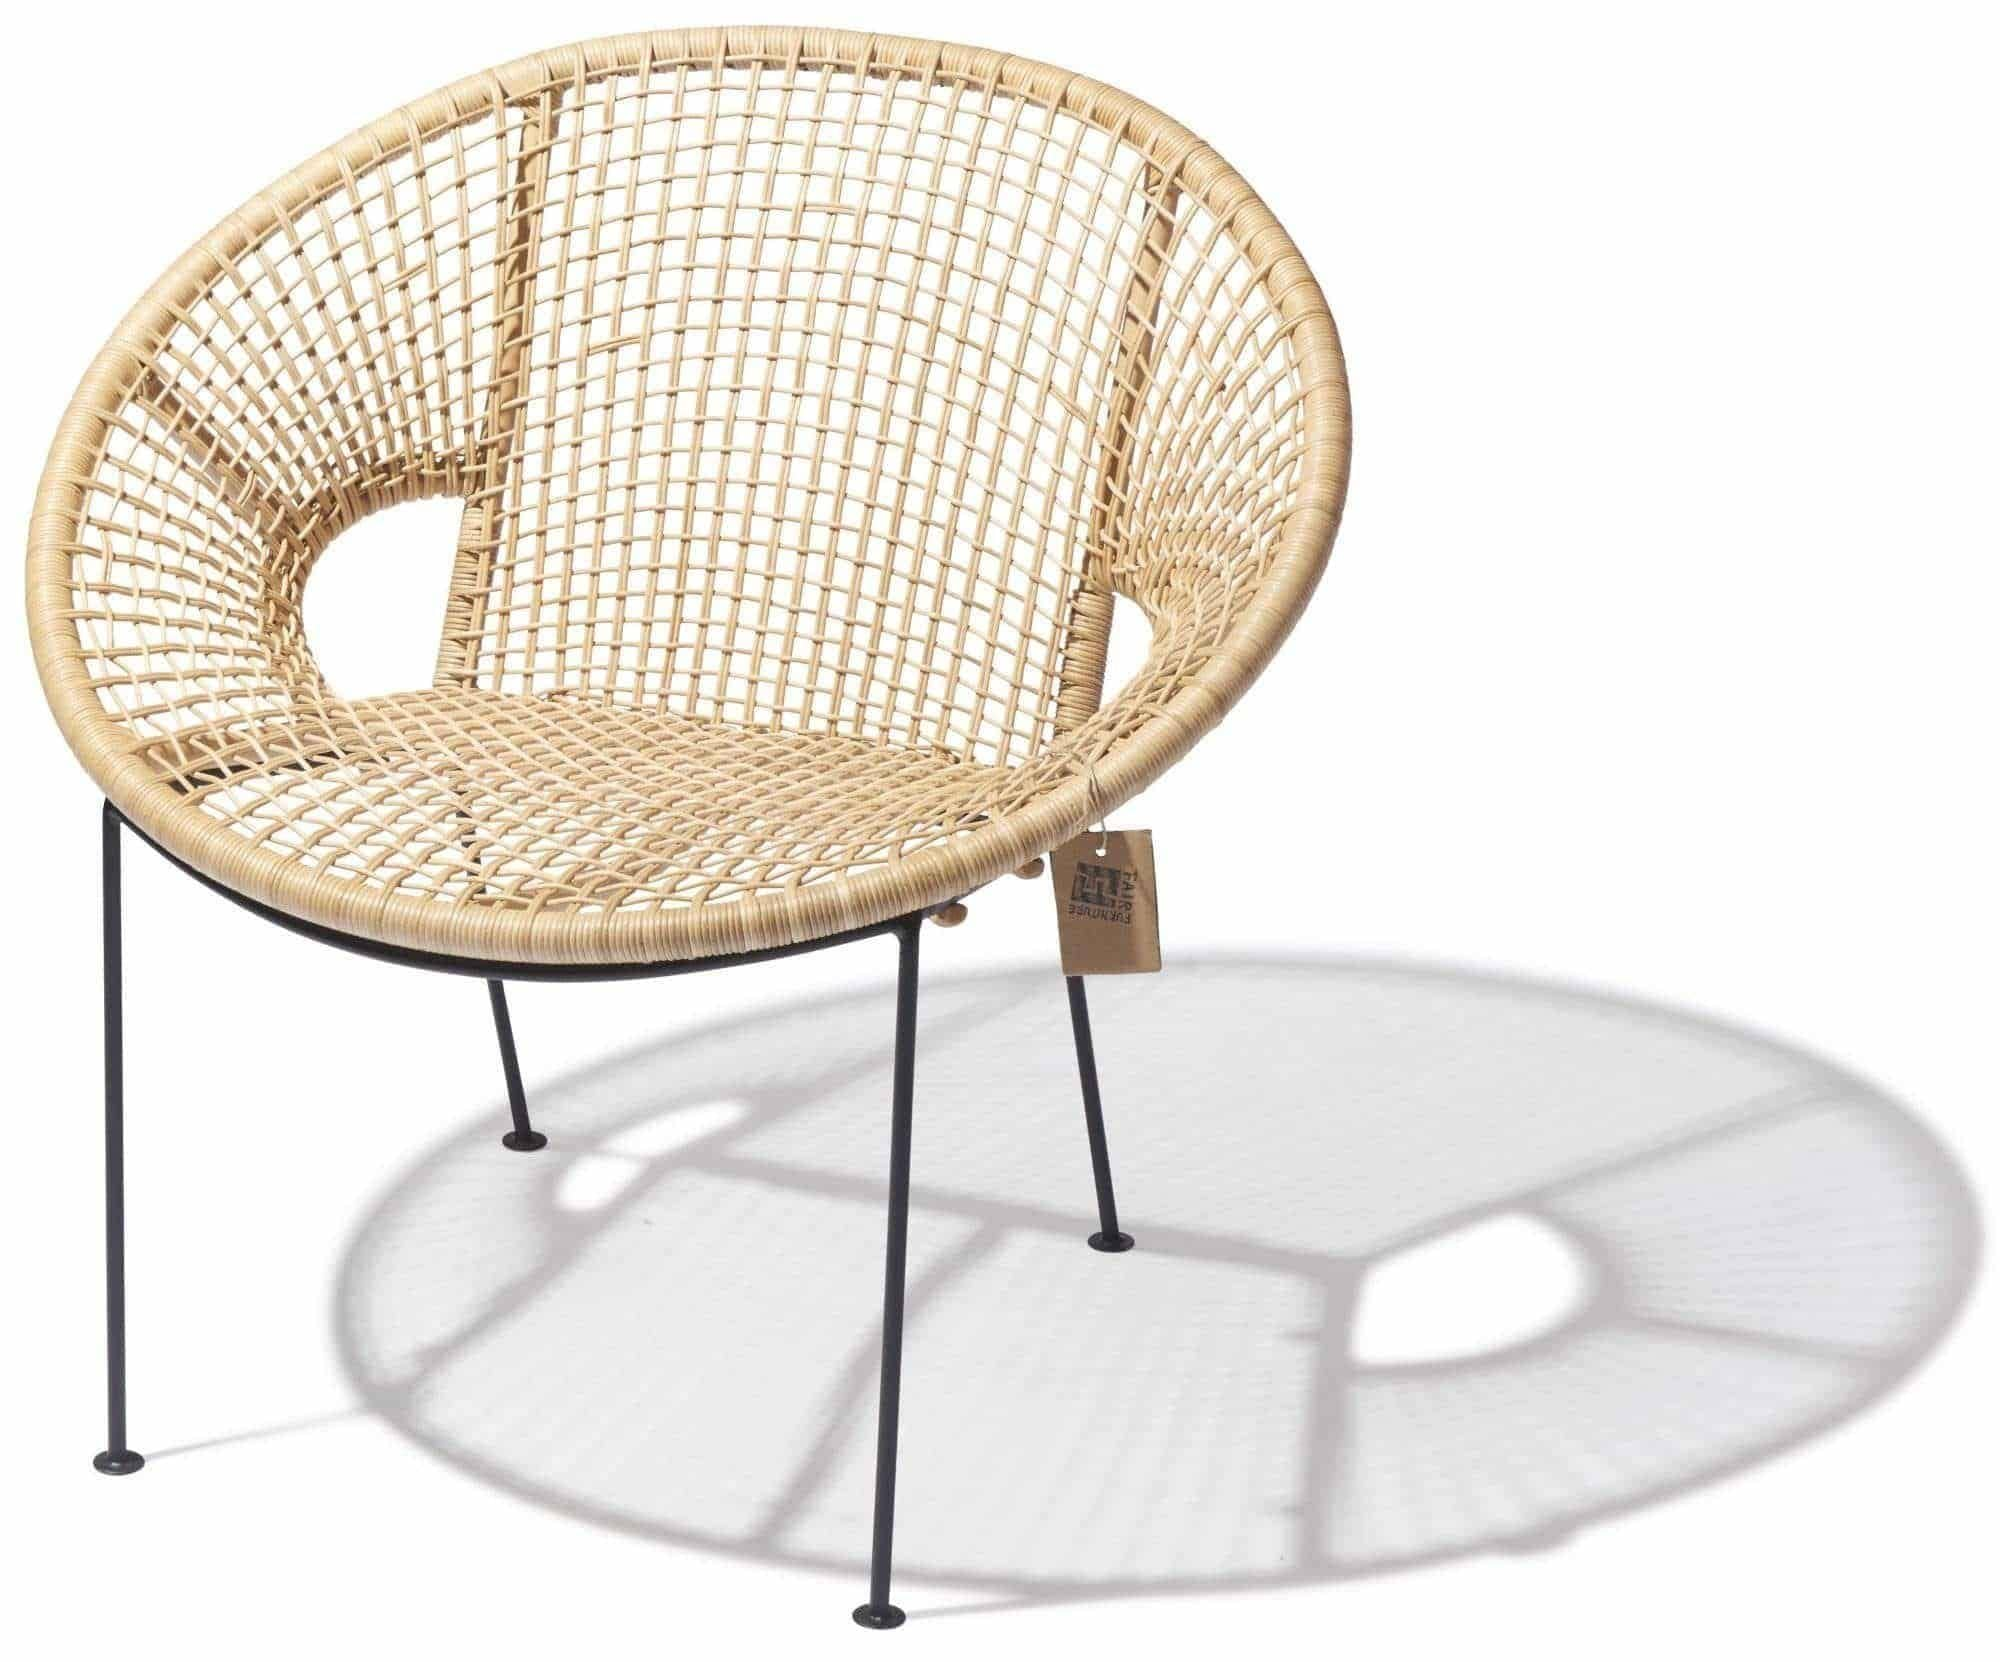 Ubud chair rotan Fair Furniture angle view